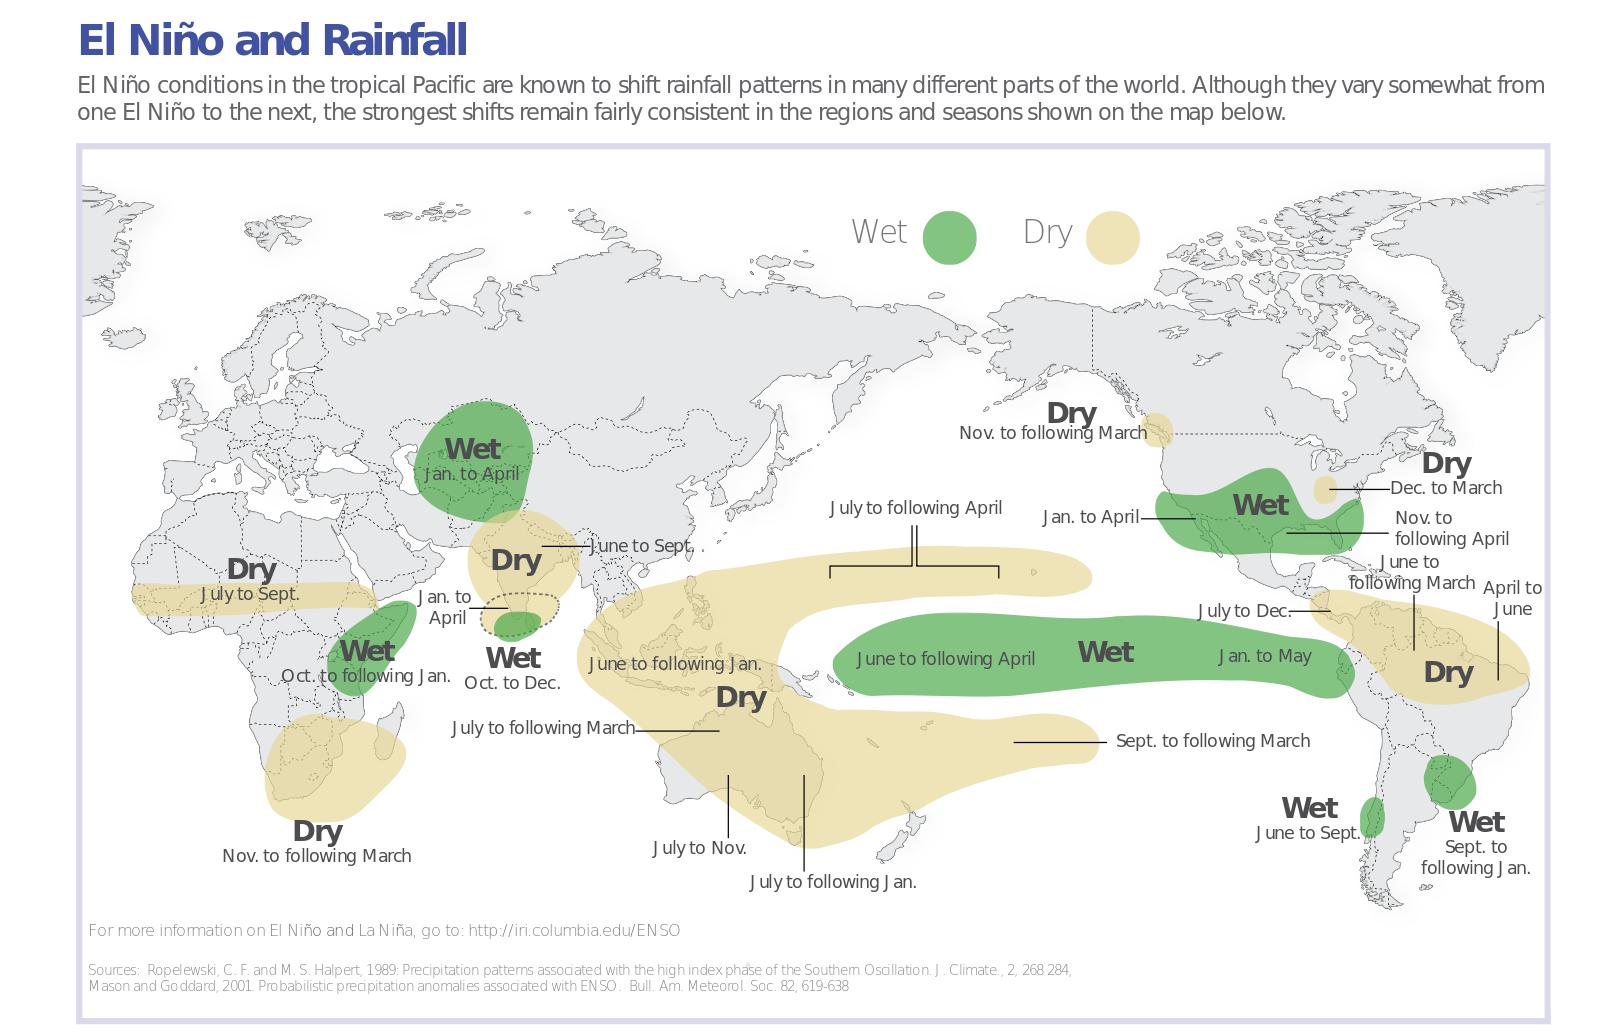 http://www.climate.gov/sites/default/files/IRI_ENSOimpactsmap_lrg.png